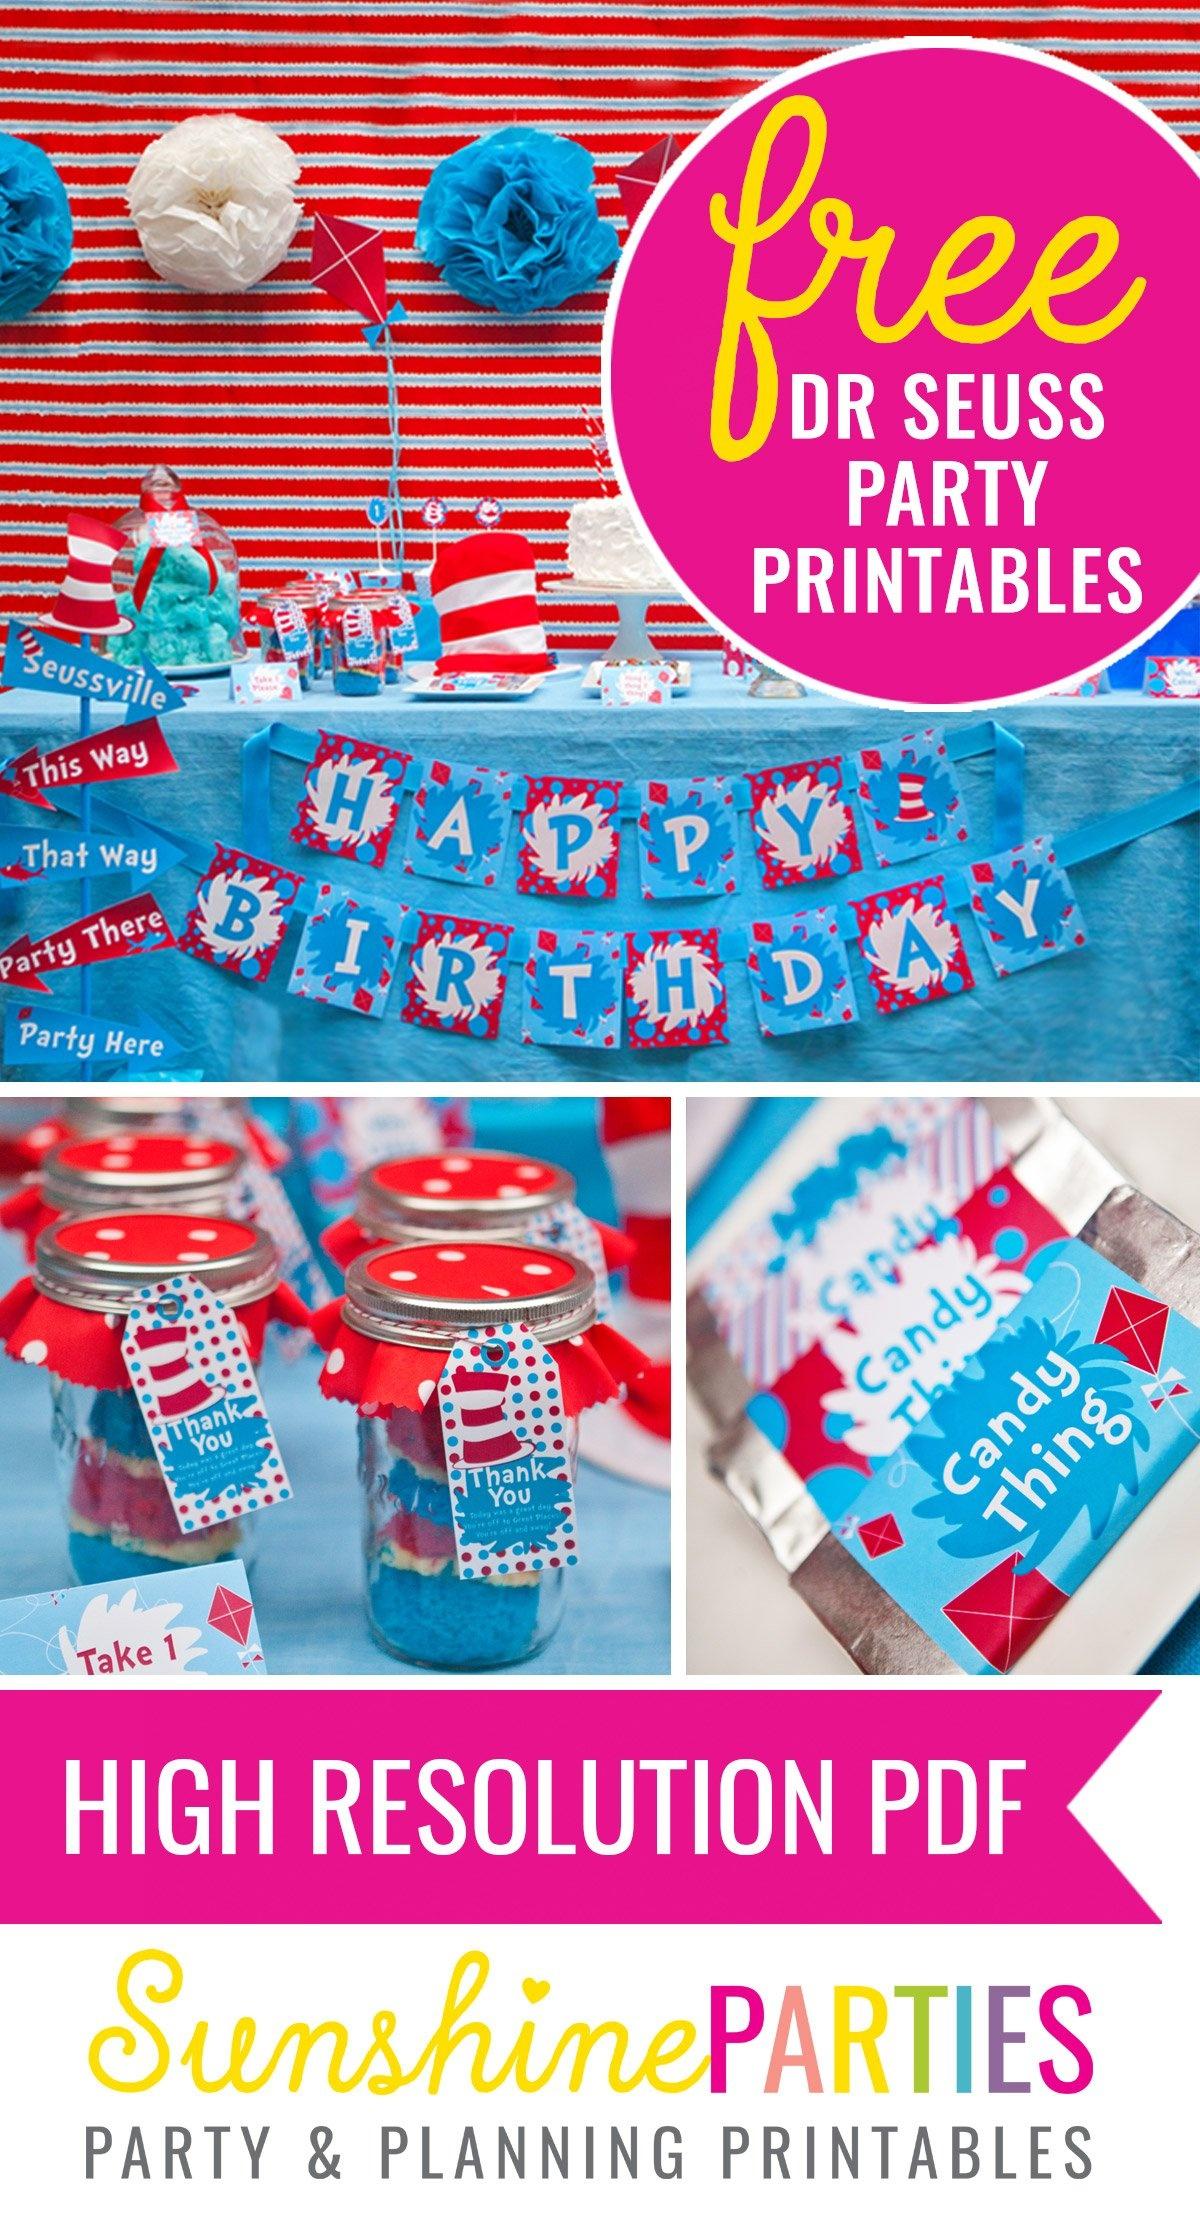 Free Dr Seuss Party Printables! - Sunshine Parties - Dr Seuss Free Printables